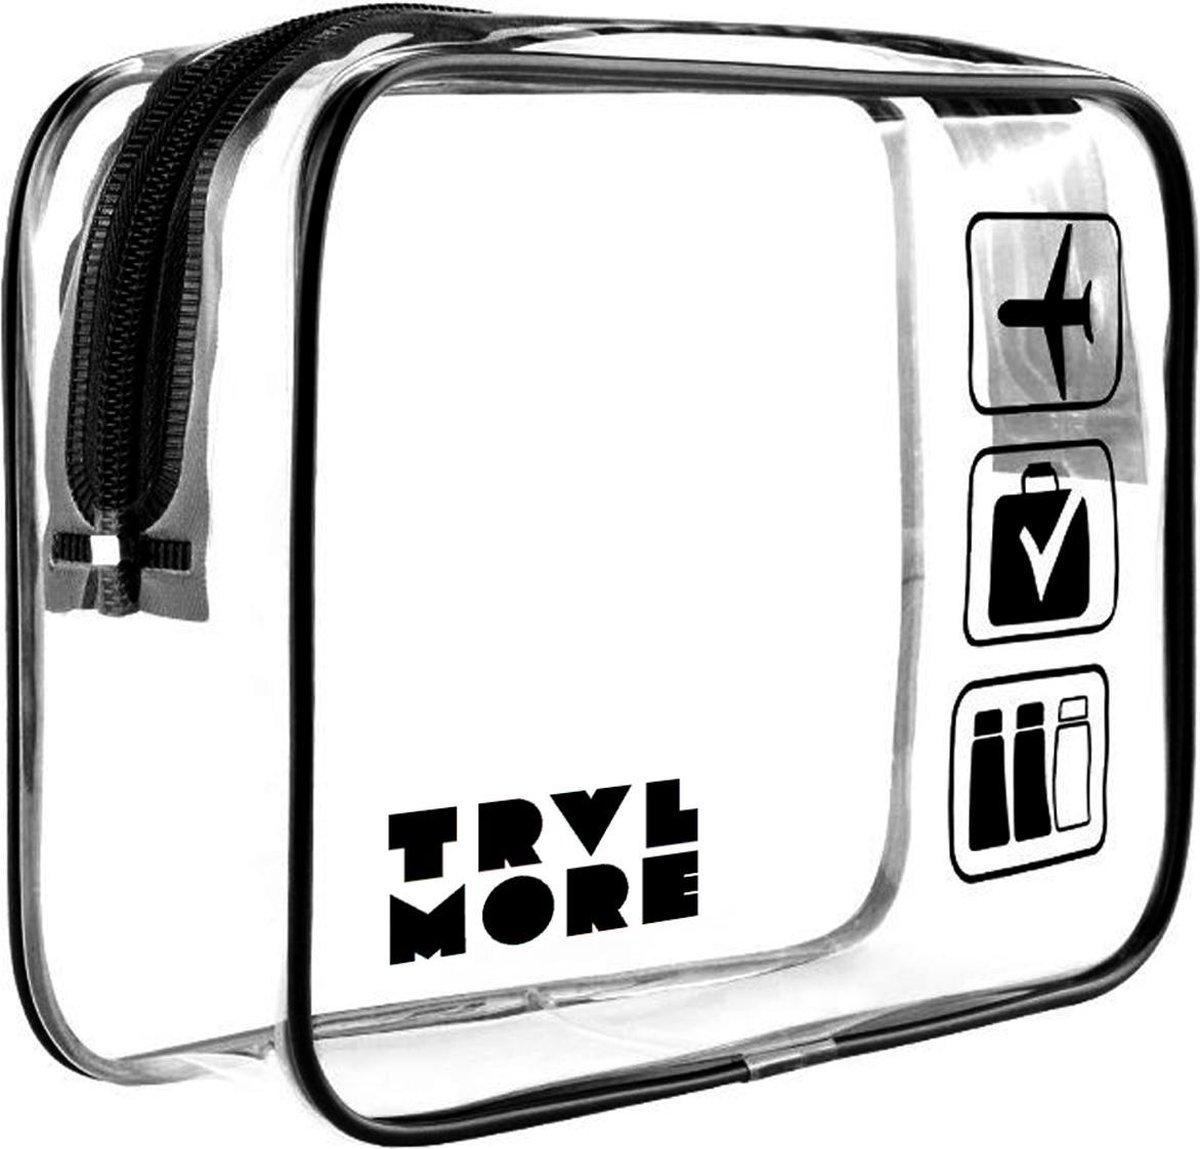 TravelMore Transparante Toilettas - Doorzichtige Make Up en Cosmetica Tas - Vloeistoffen Etui - Trav